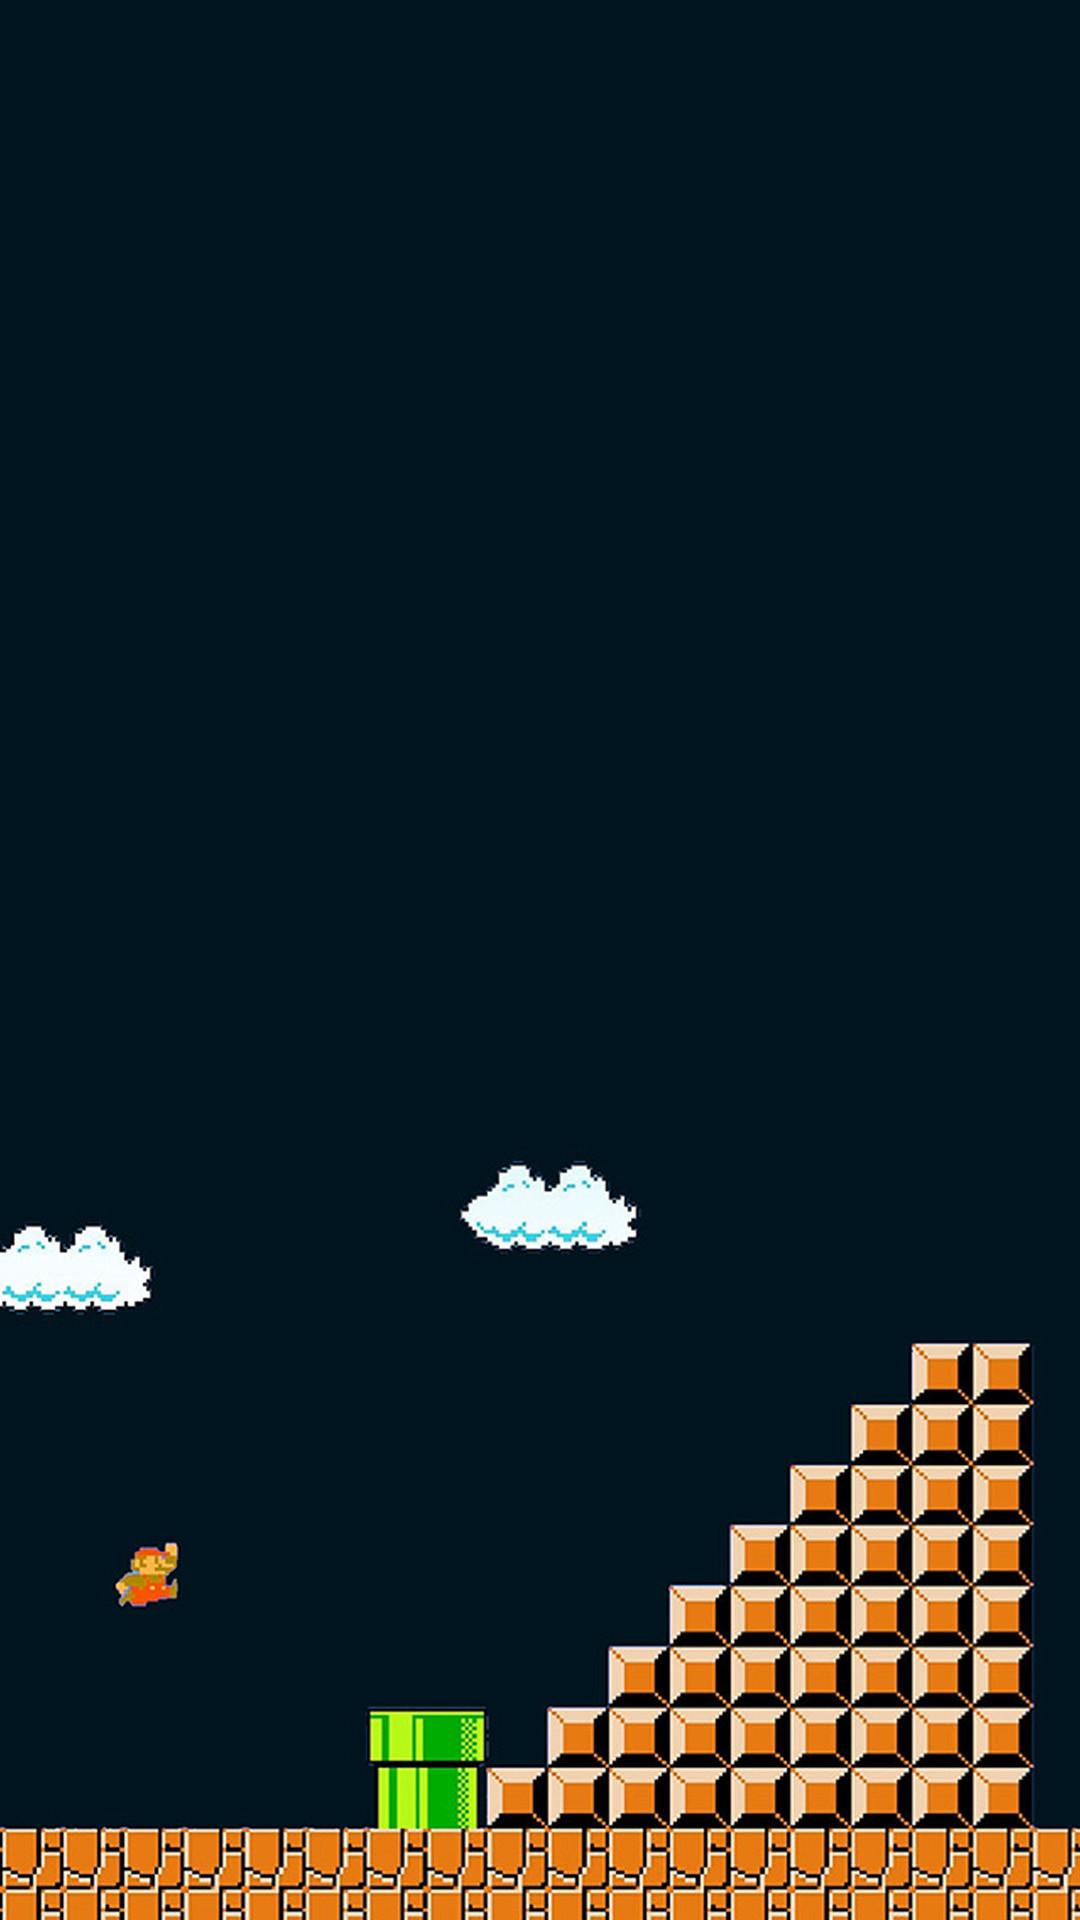 wallpaper-pixel-world-game-9-wallpaper